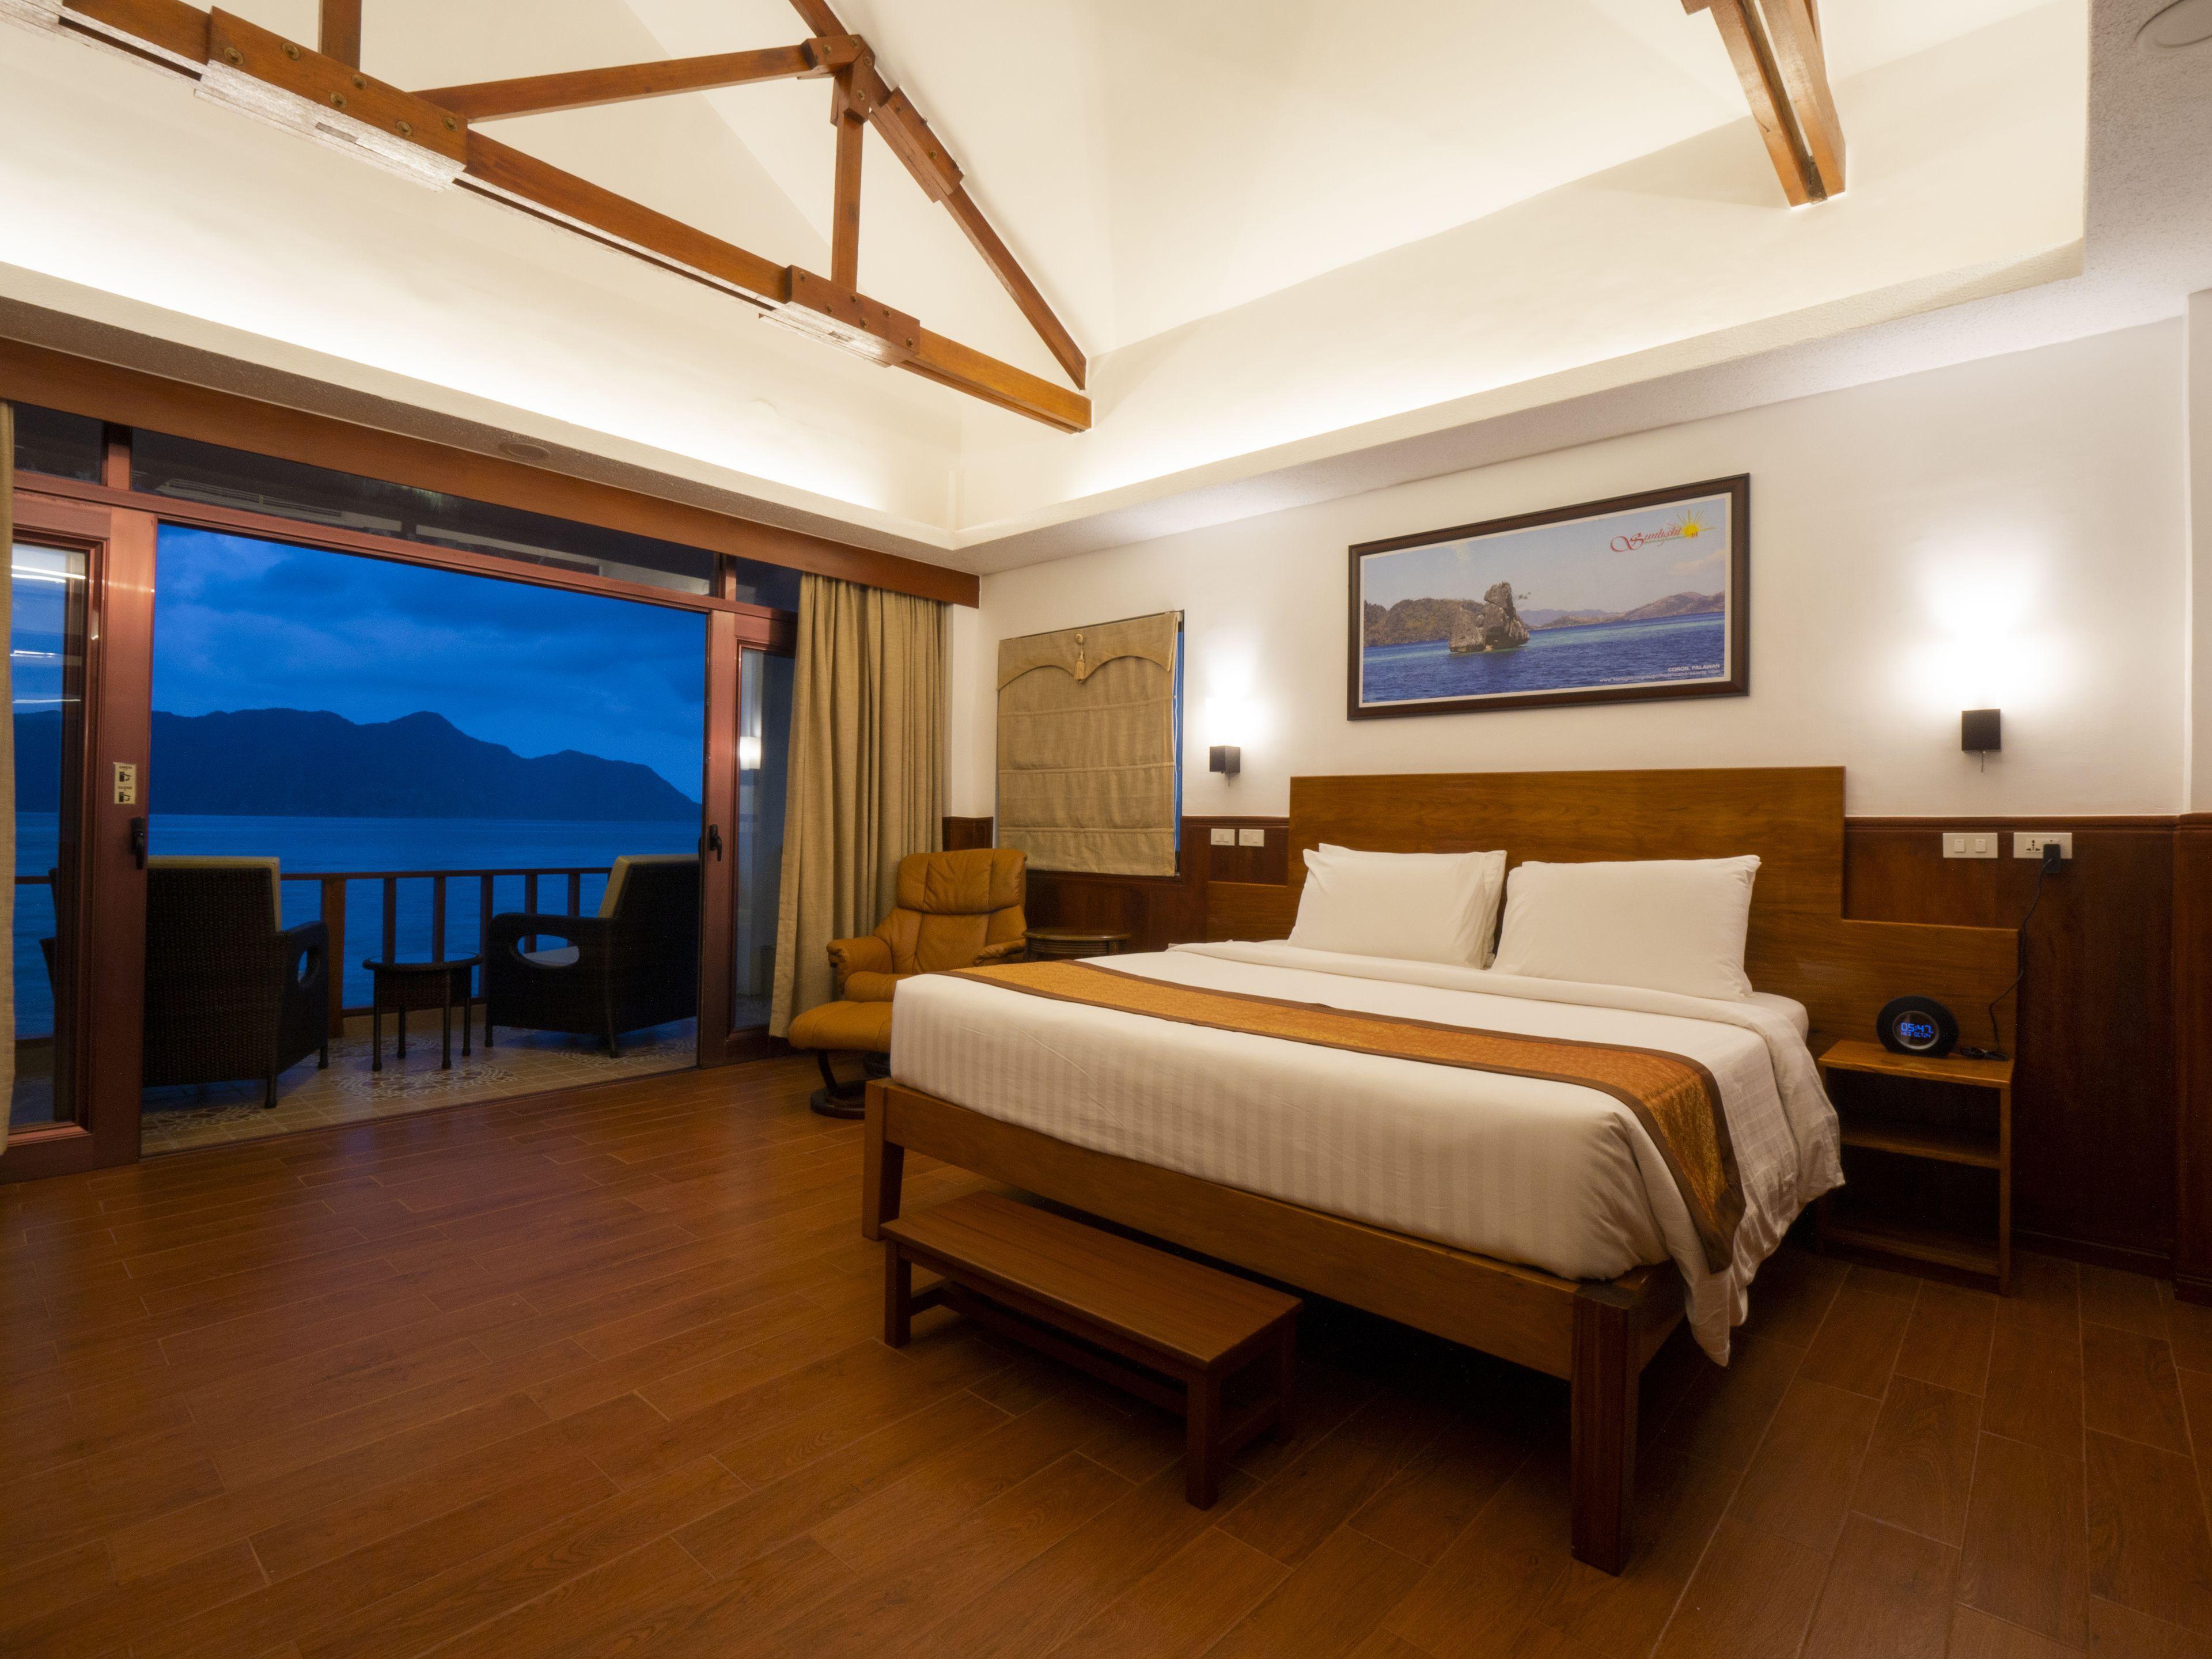 Courtesy of Sunlight Eco Tourism Island Resort / Expedia